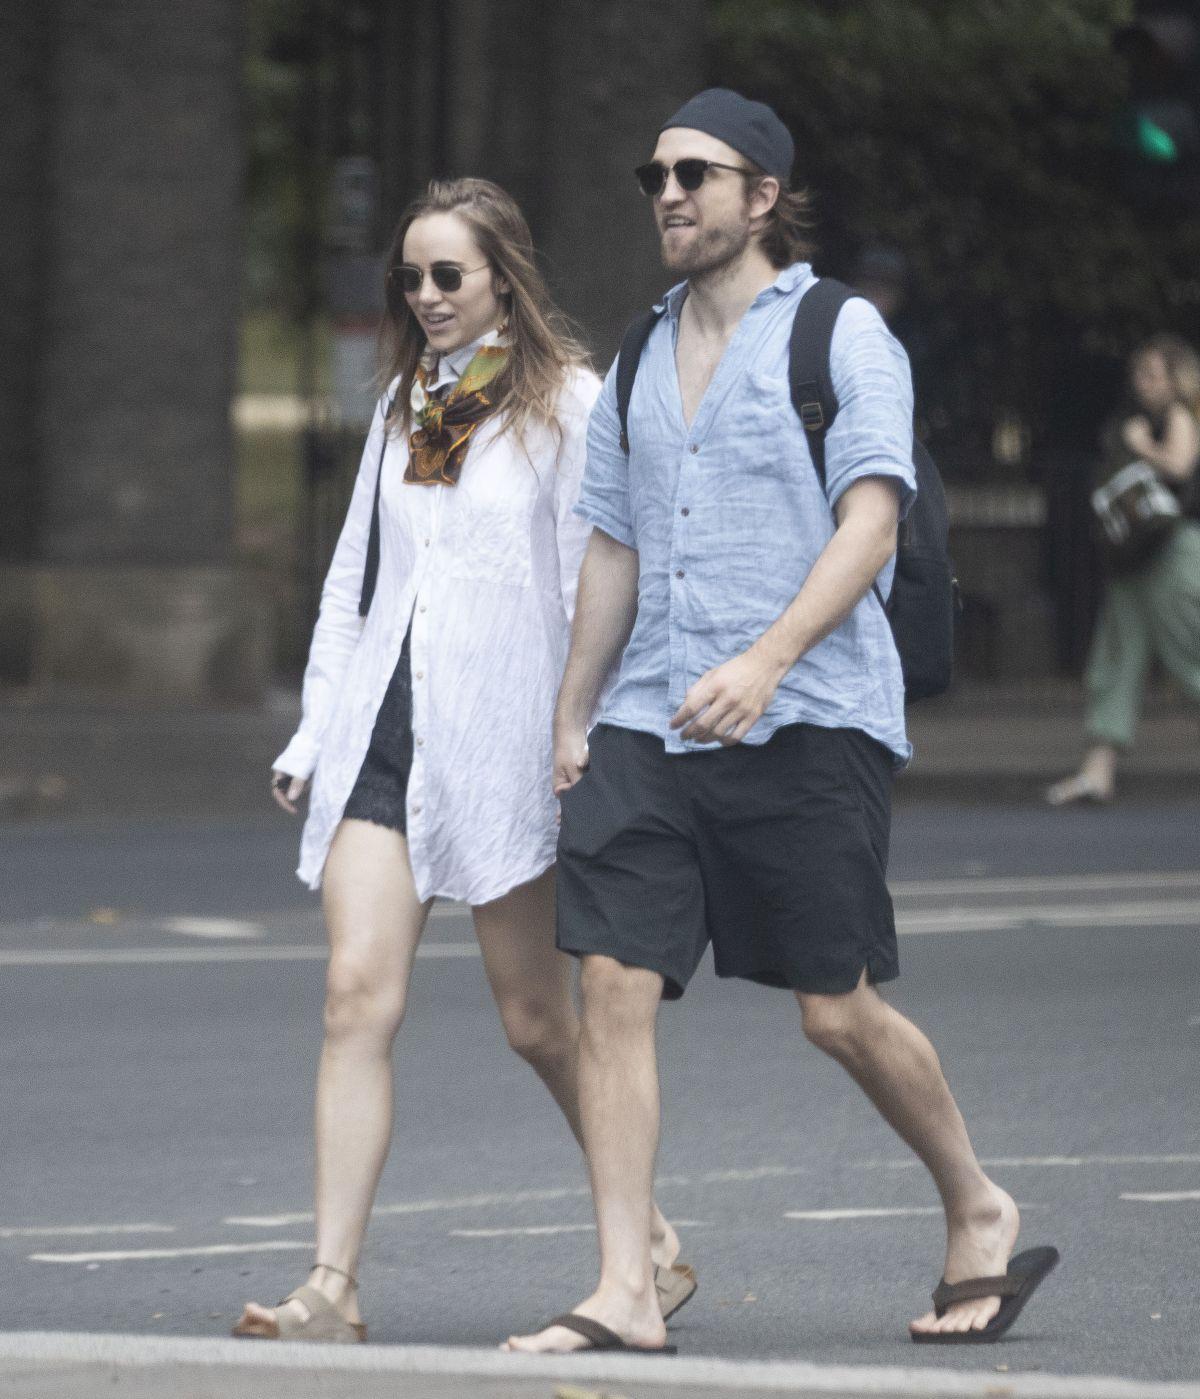 SUKI WATERHOUSE and Robert Pattinson Out in London 06/18 ...